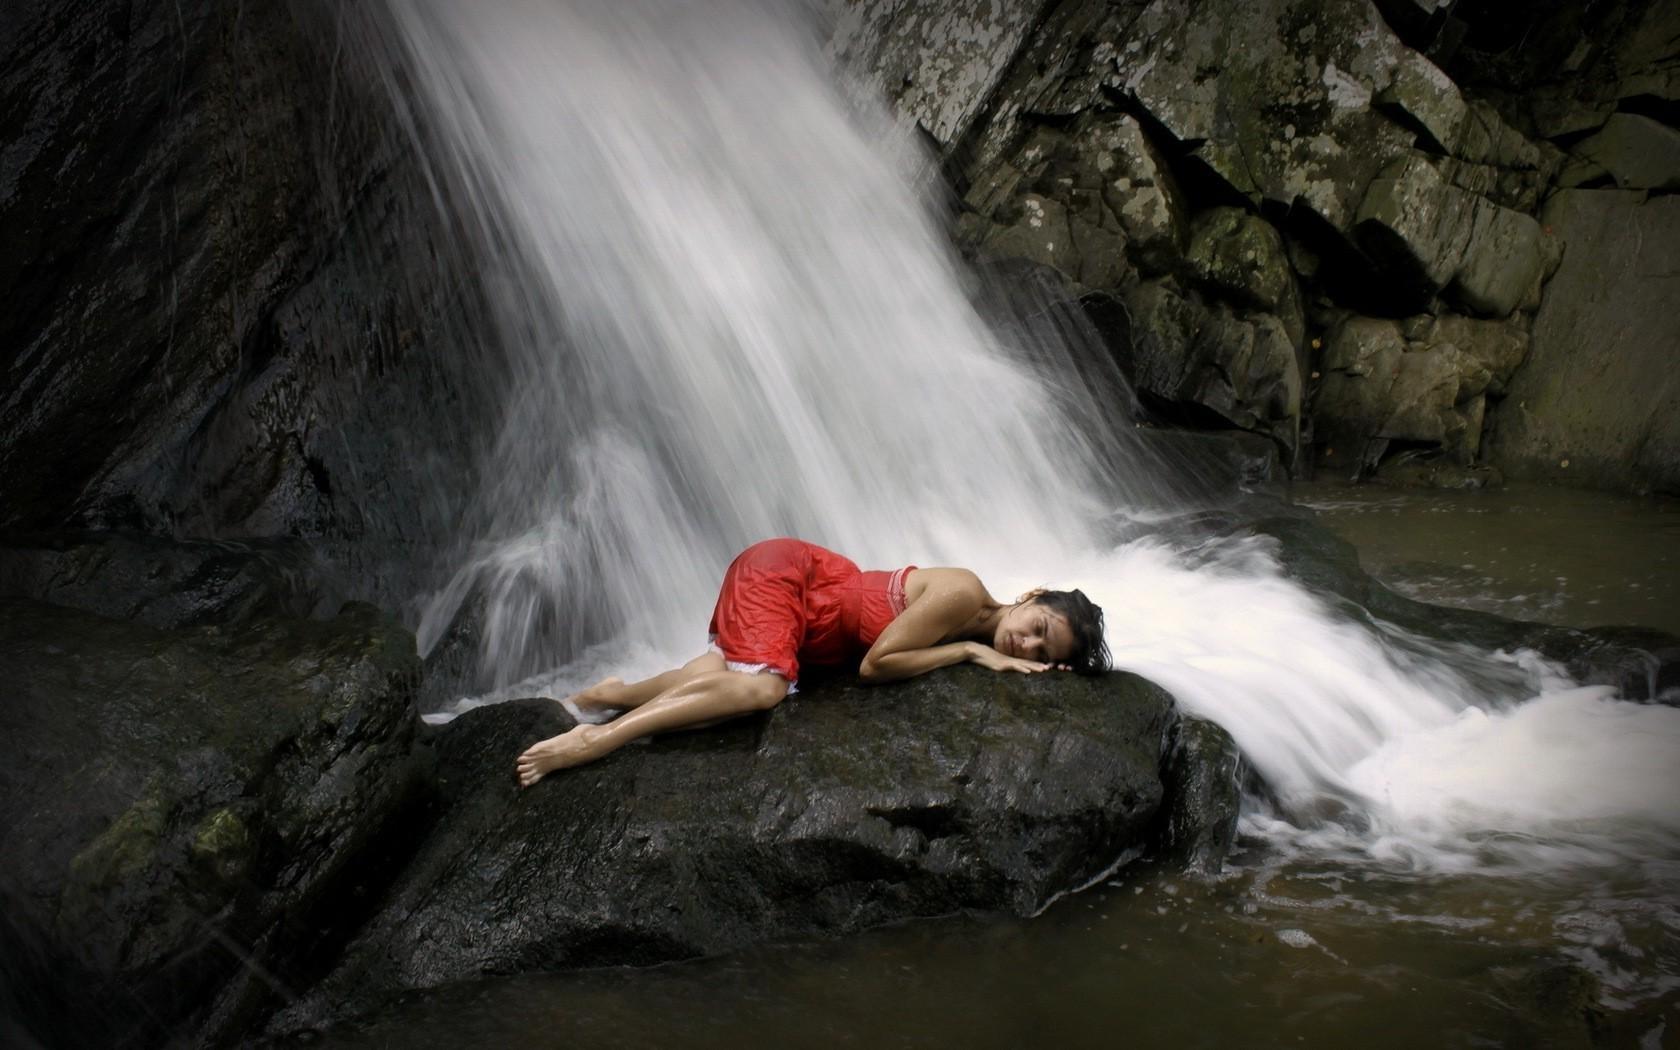 Waterfall Girls Naked - Galeries Porno-9932